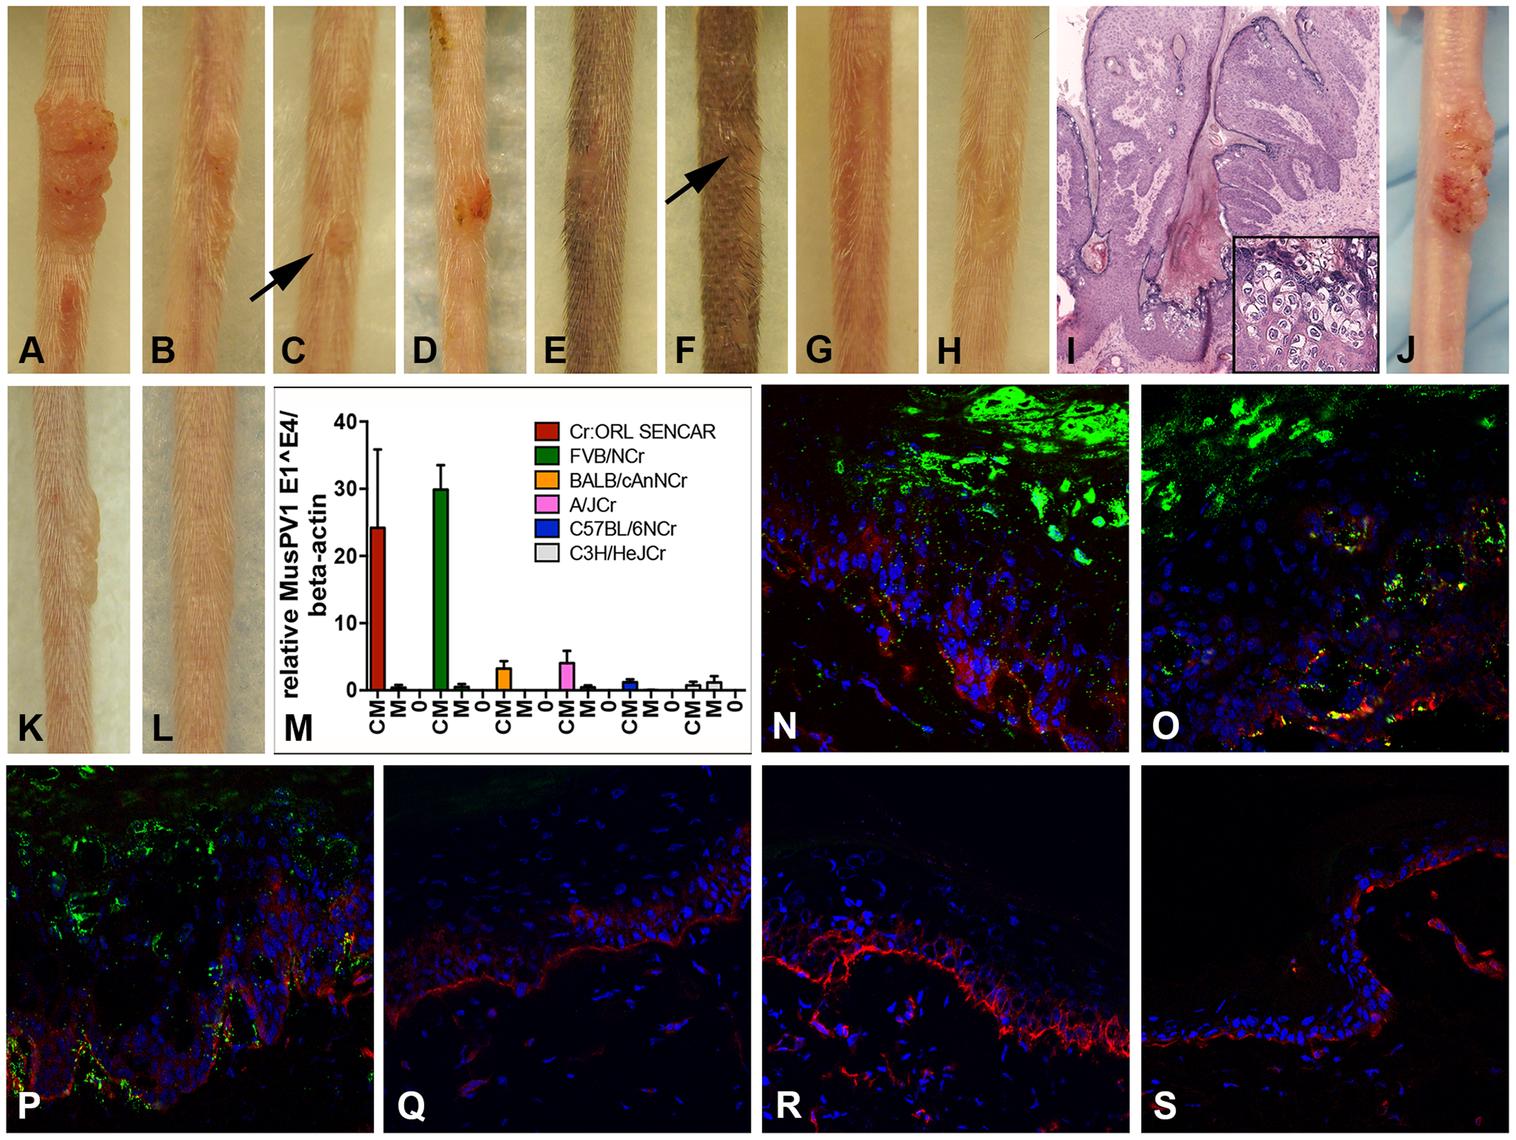 Cyclosporin (CsA) administration promotes MusPV1 infection and strain-dependent papilloma formation.